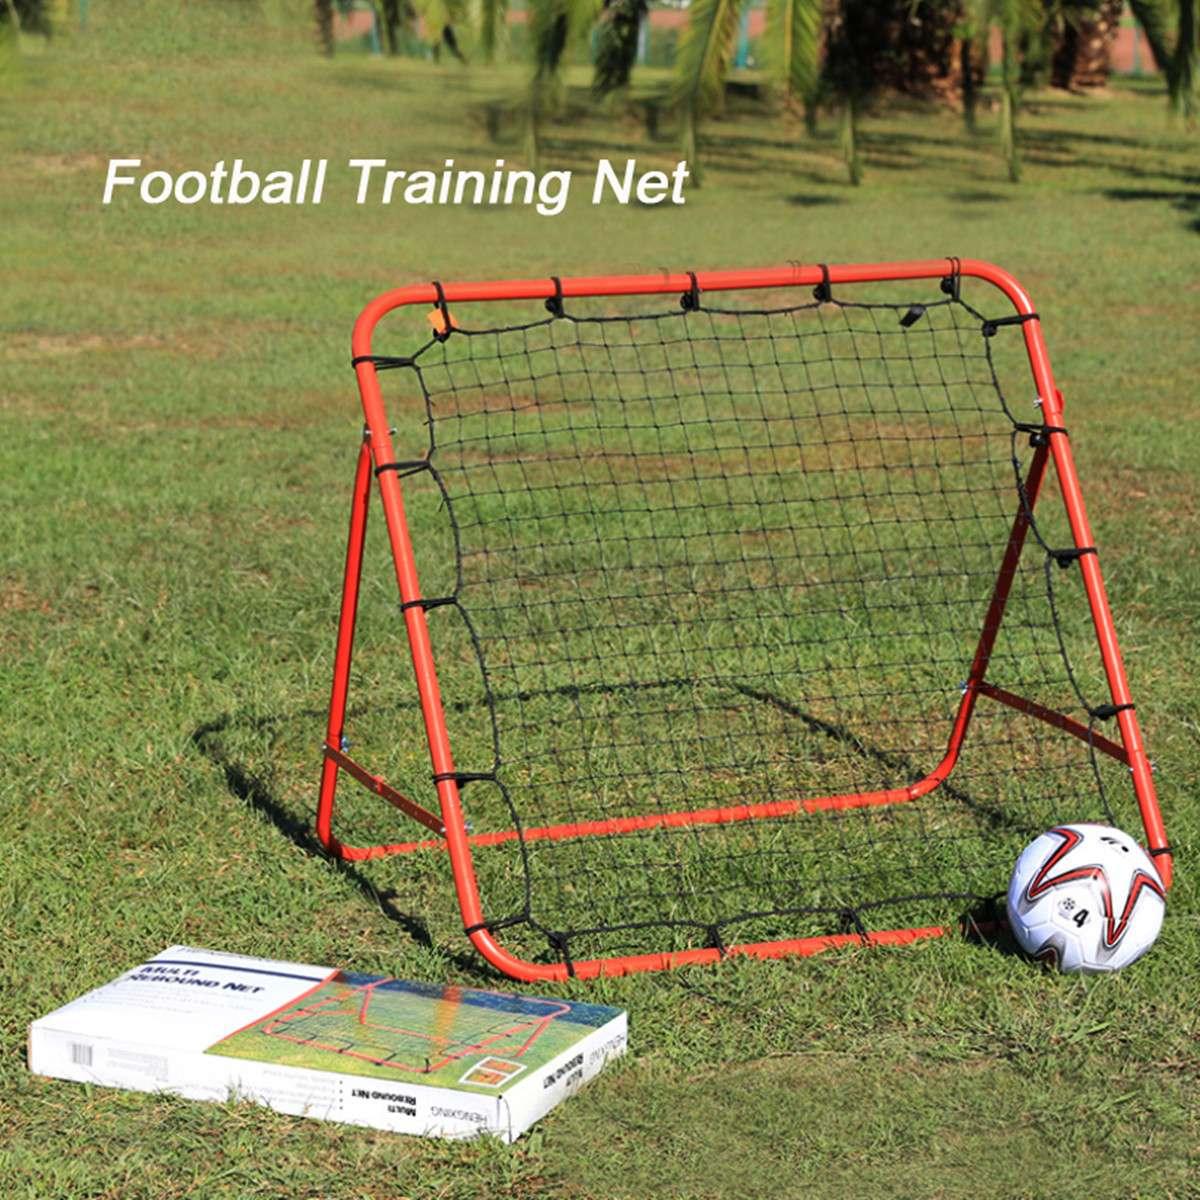 Filet de Football but de Football Net rebond cible maille filet Sports de plein air Football entraînement aide ballon de Football pratique